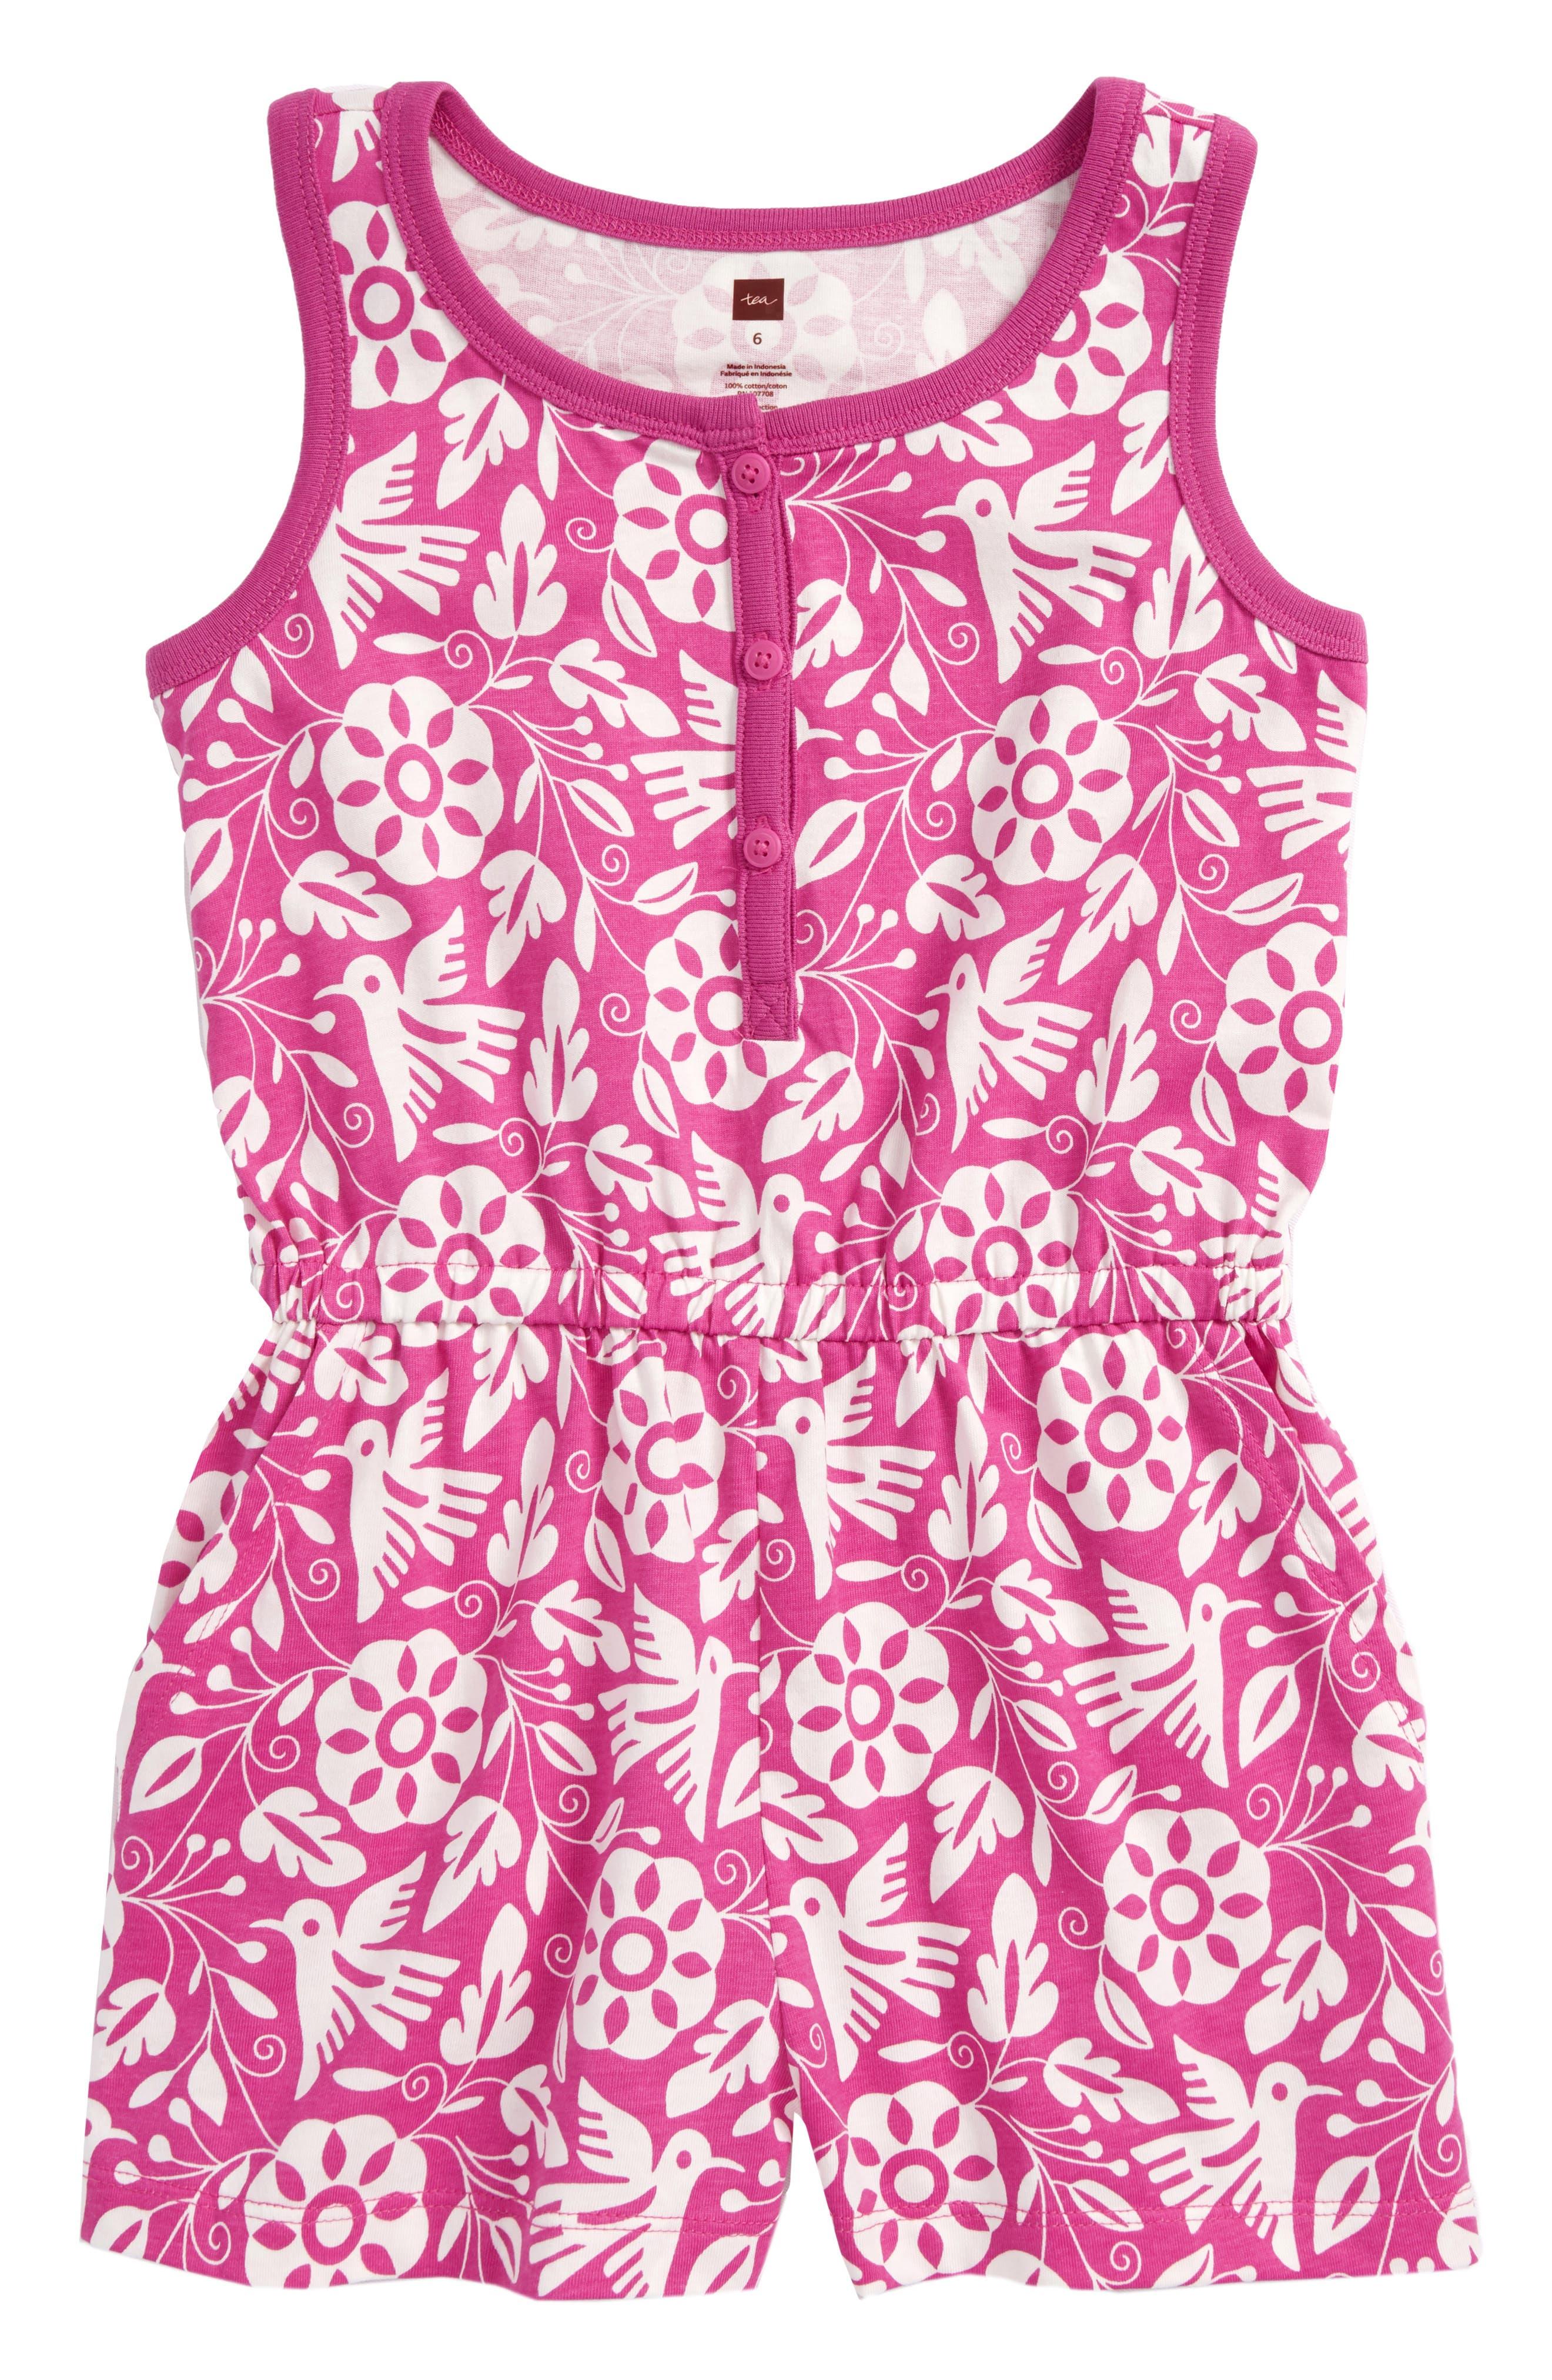 Main Image - Tea Collection Hawaiian Knit Romper (Toddler Girls, Little Girls & Big Girls)